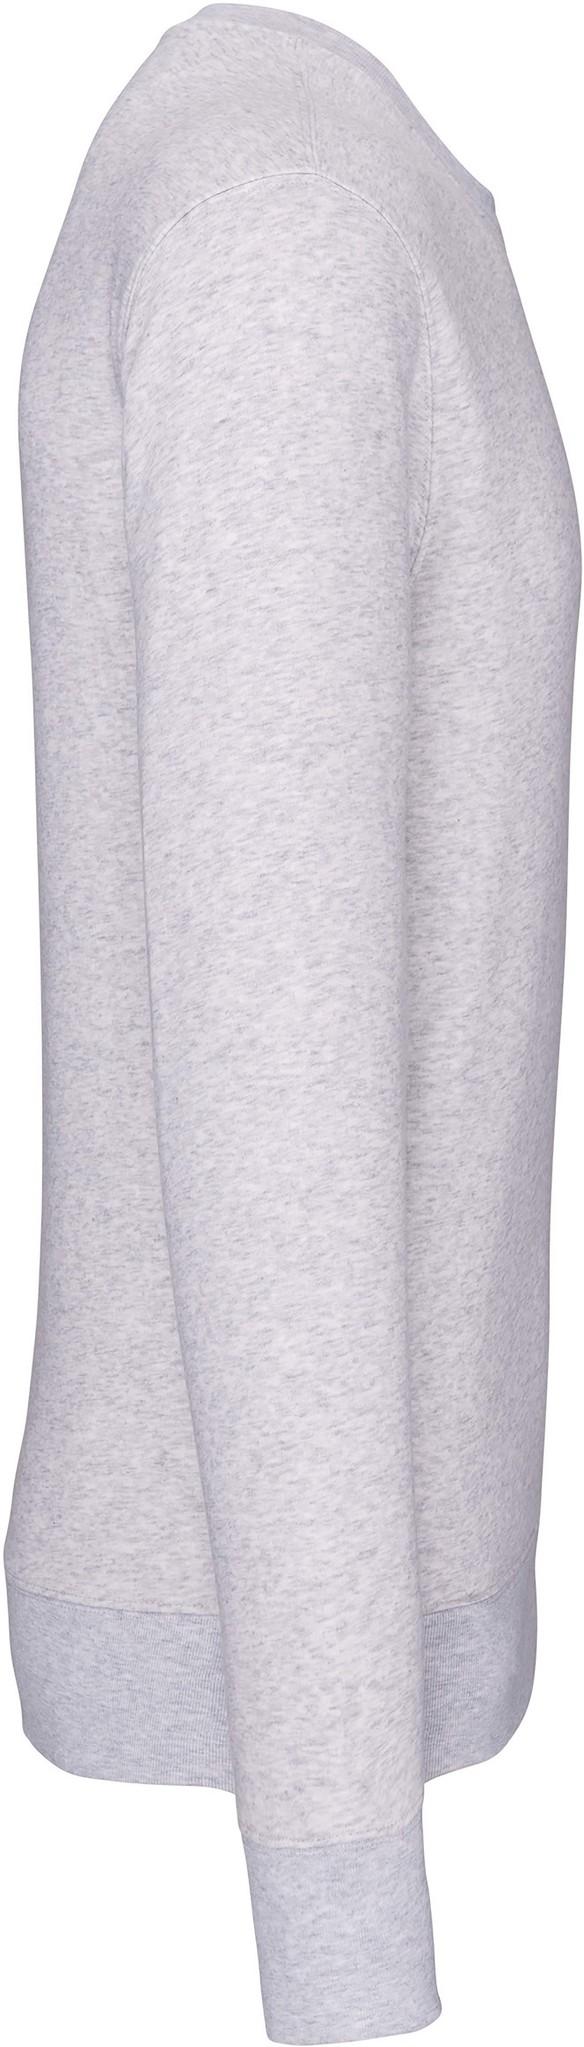 Eco-Friendly Sweater UNI Ash-Gemêleerd